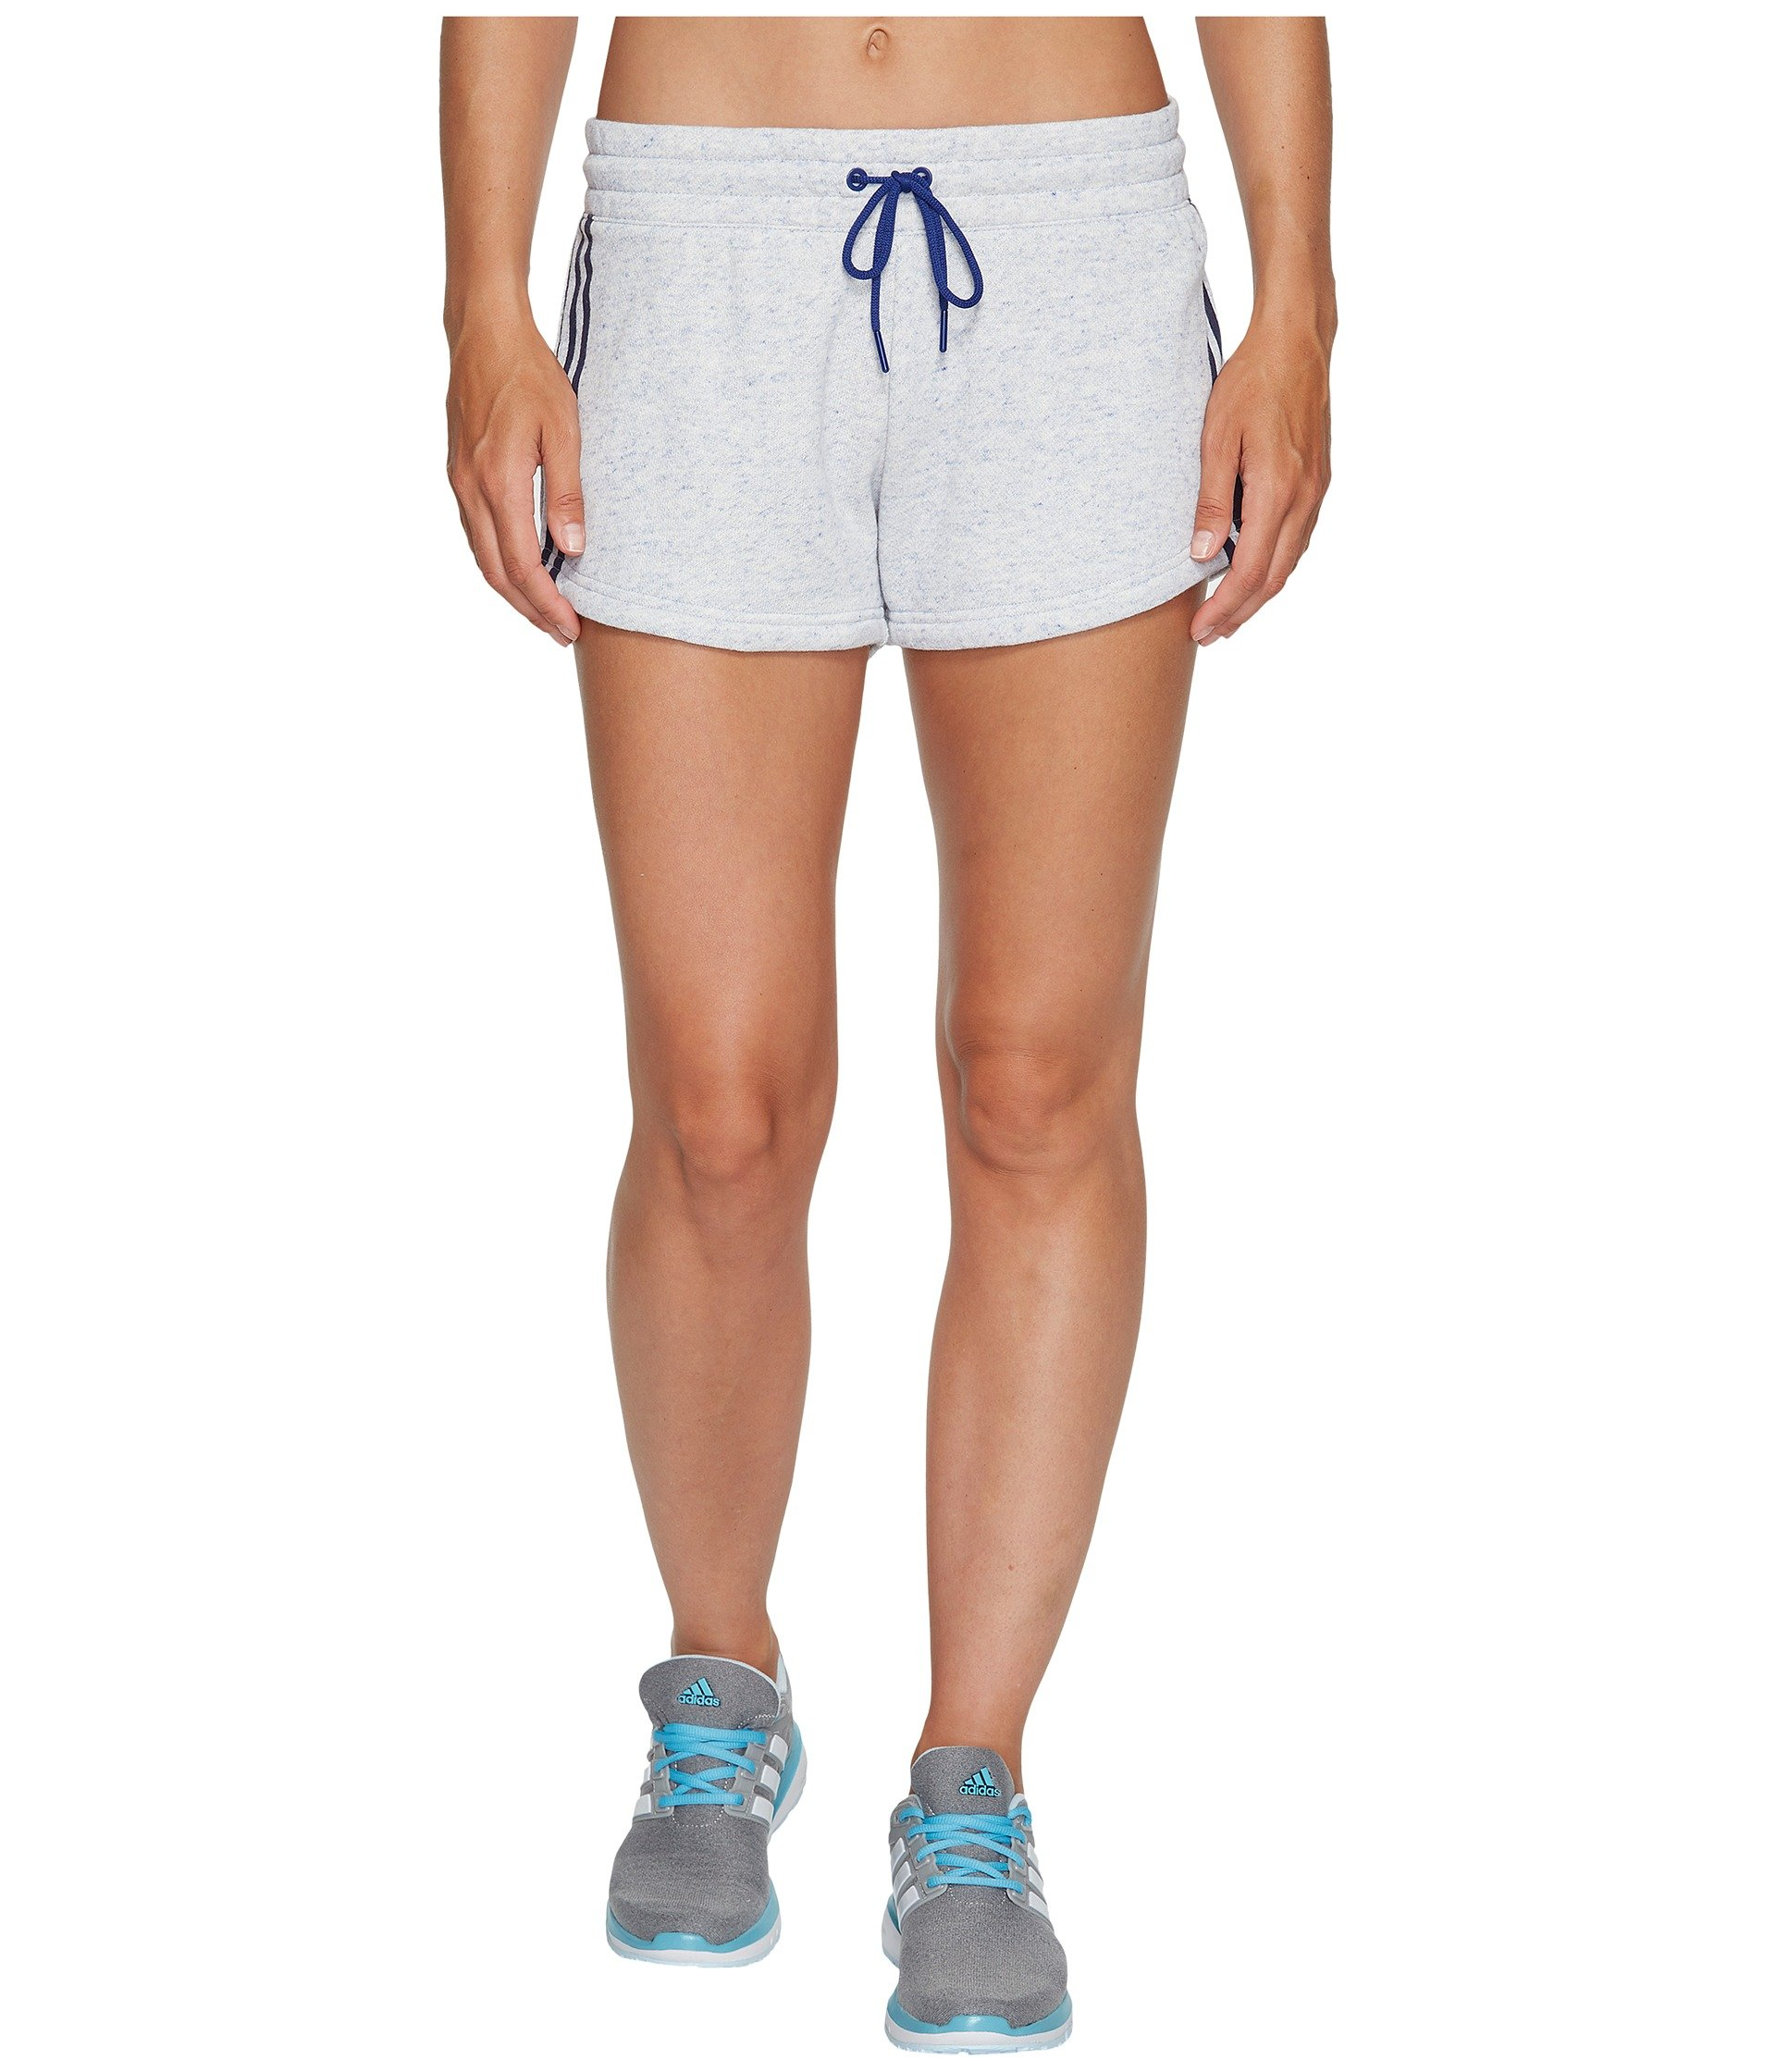 adidas Women's Athletics Sport 2 Street Shorts, Mystery Ink Melange, Medium by adidas